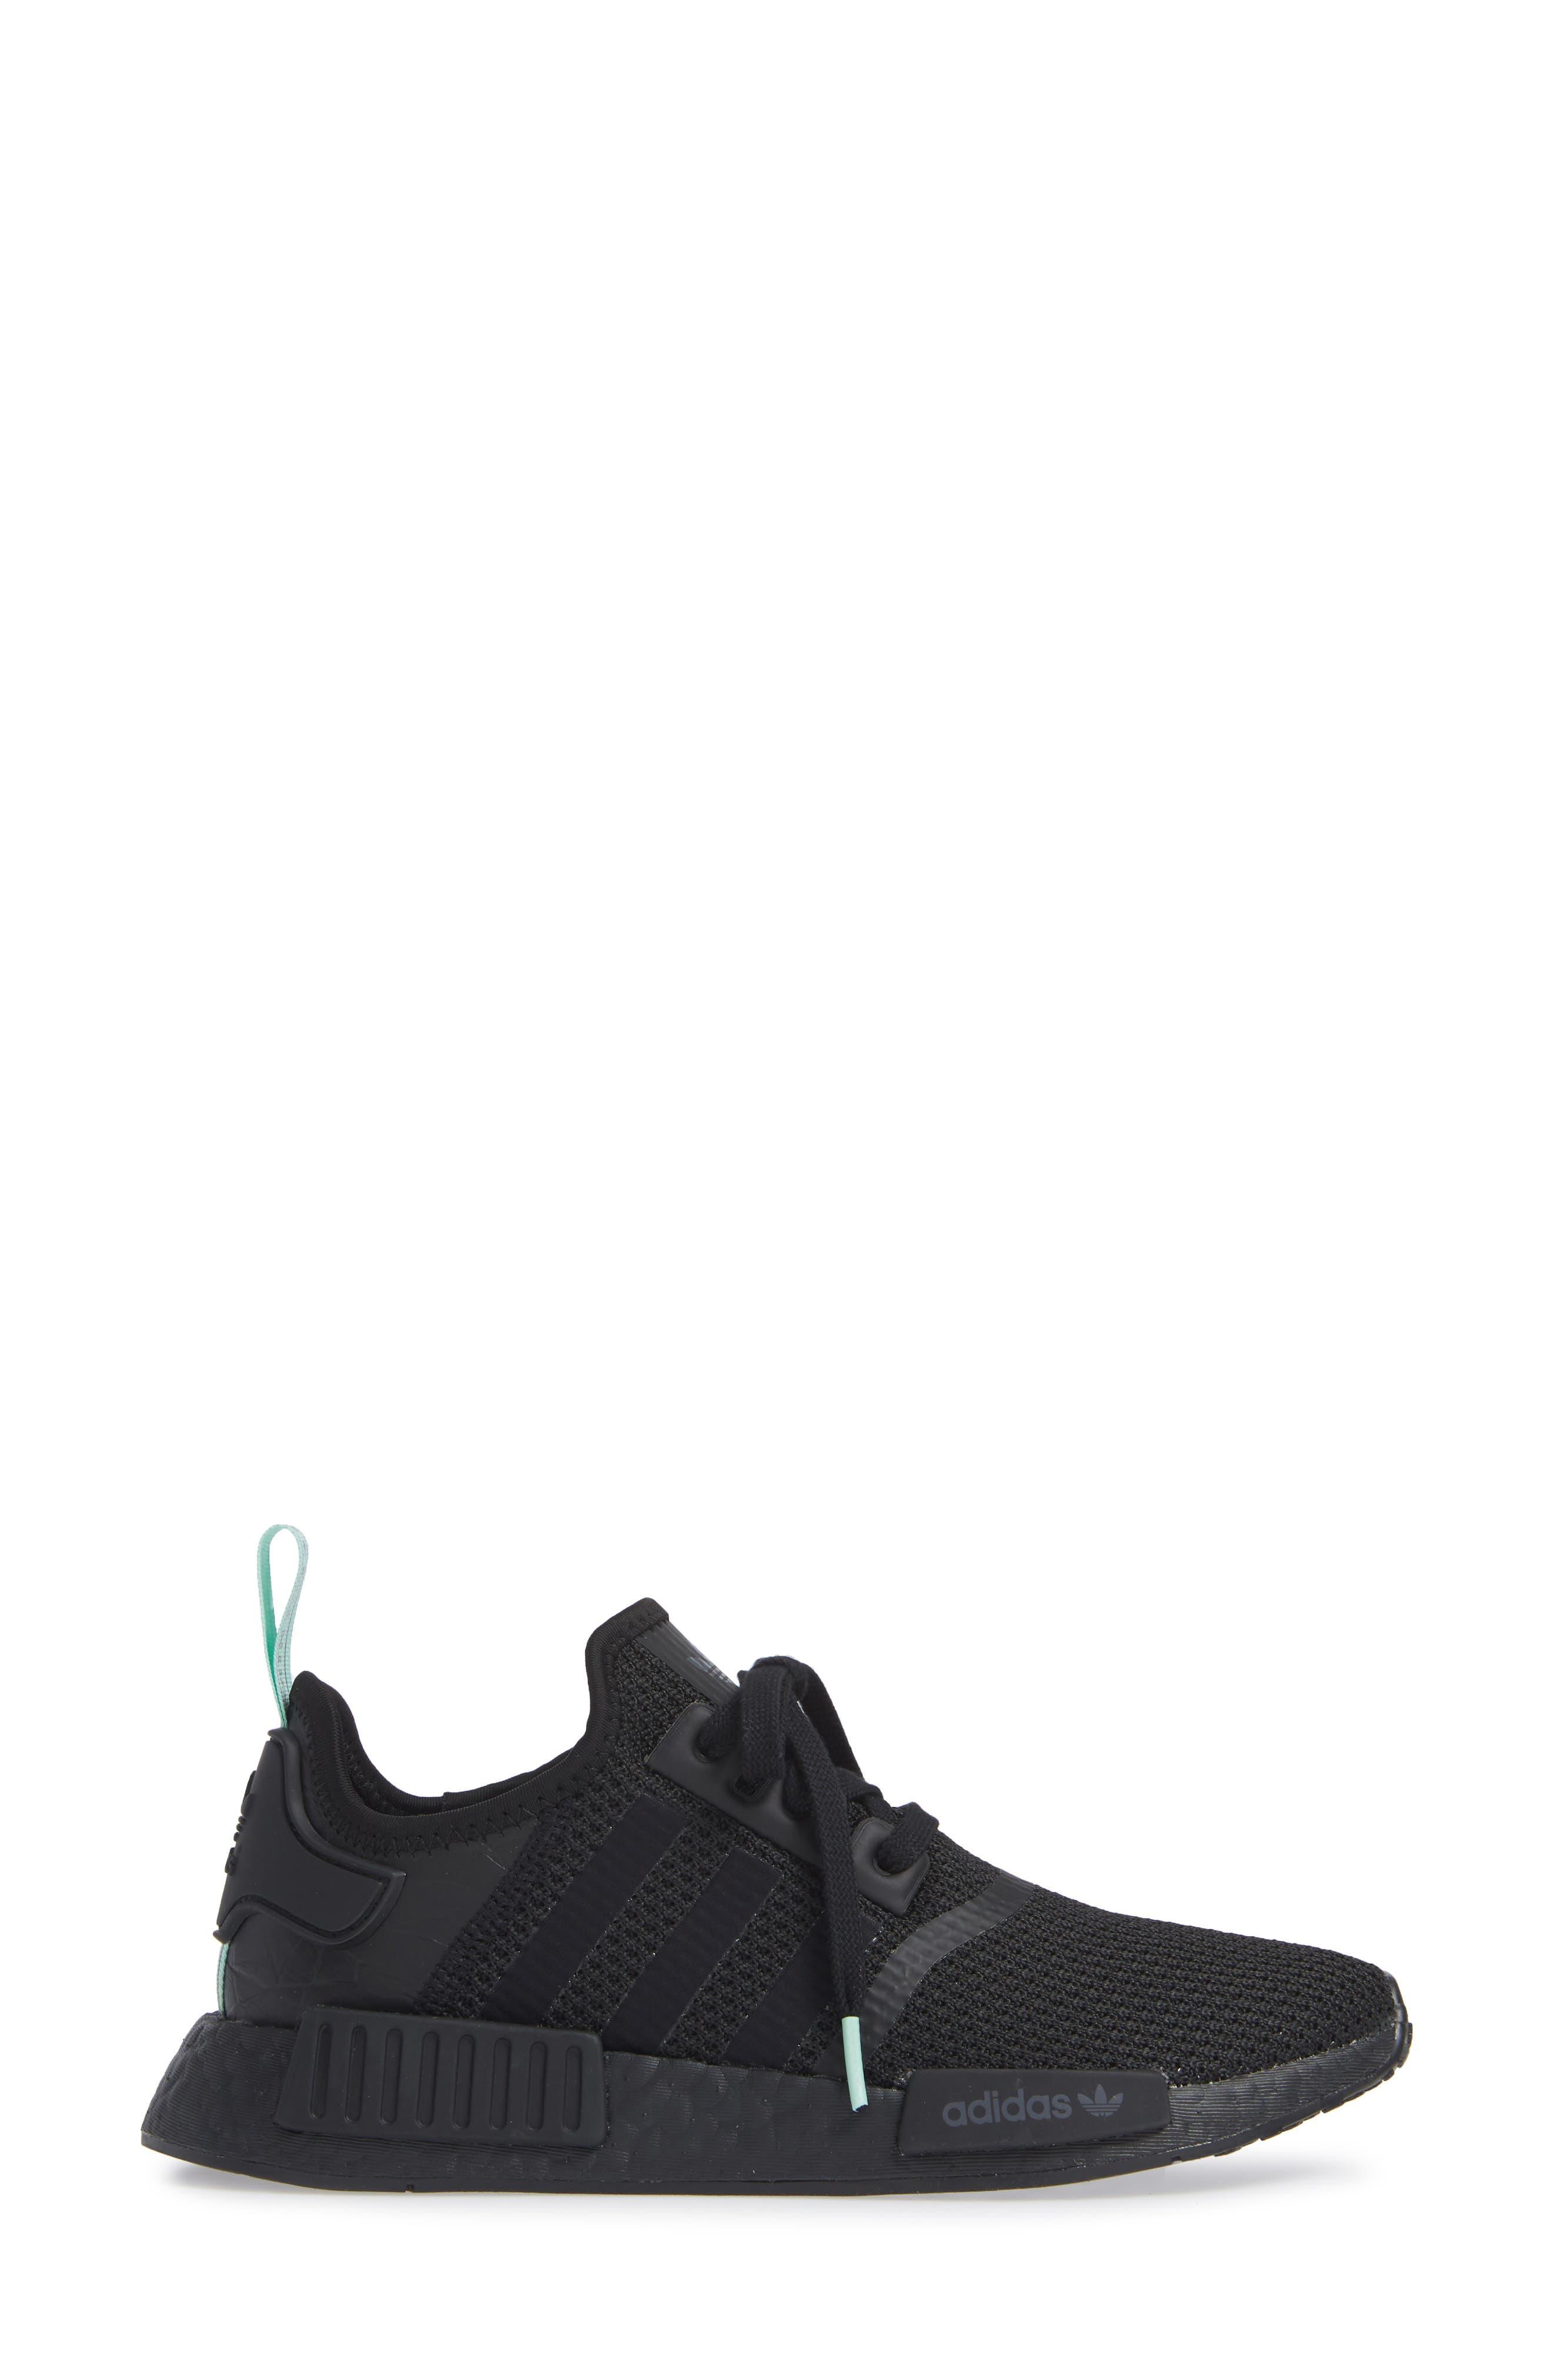 NMD R1 Athletic Shoe,                             Alternate thumbnail 3, color,                             BLACK/ BLACK/ CLEAR MINT